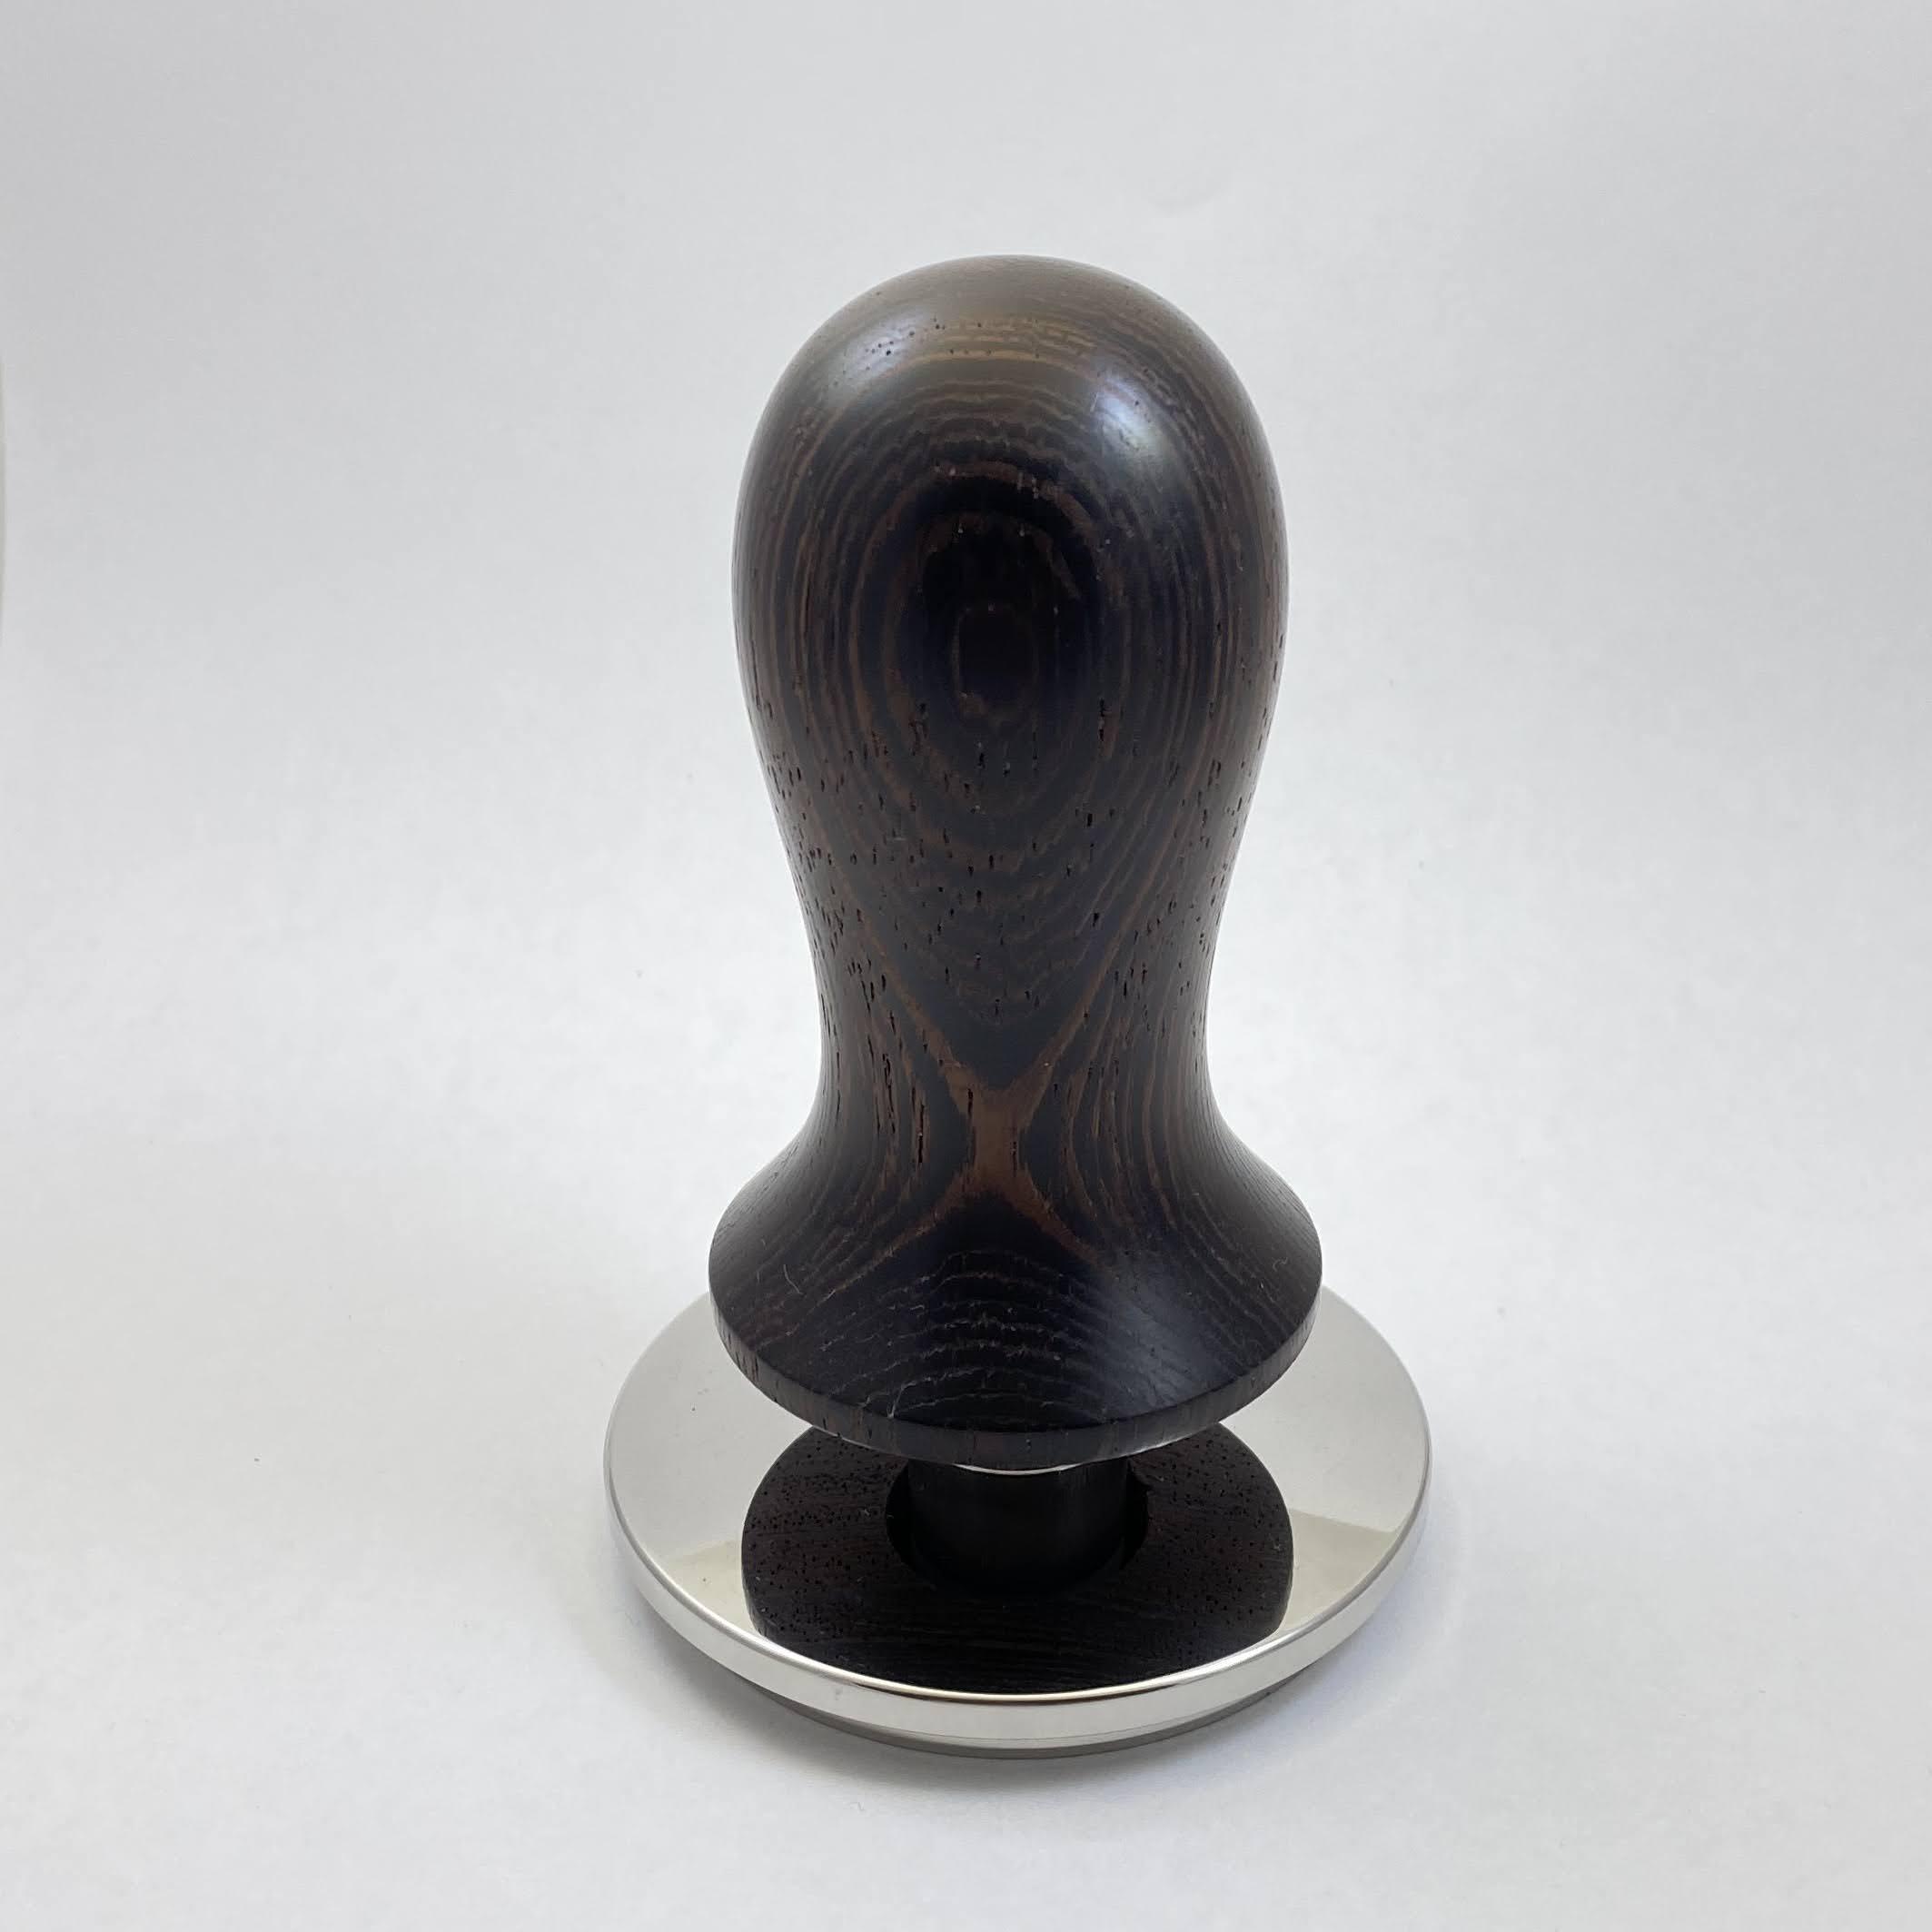 LevTamp Wenge - Auto-Leveling Espresso Tamper 58.5mm